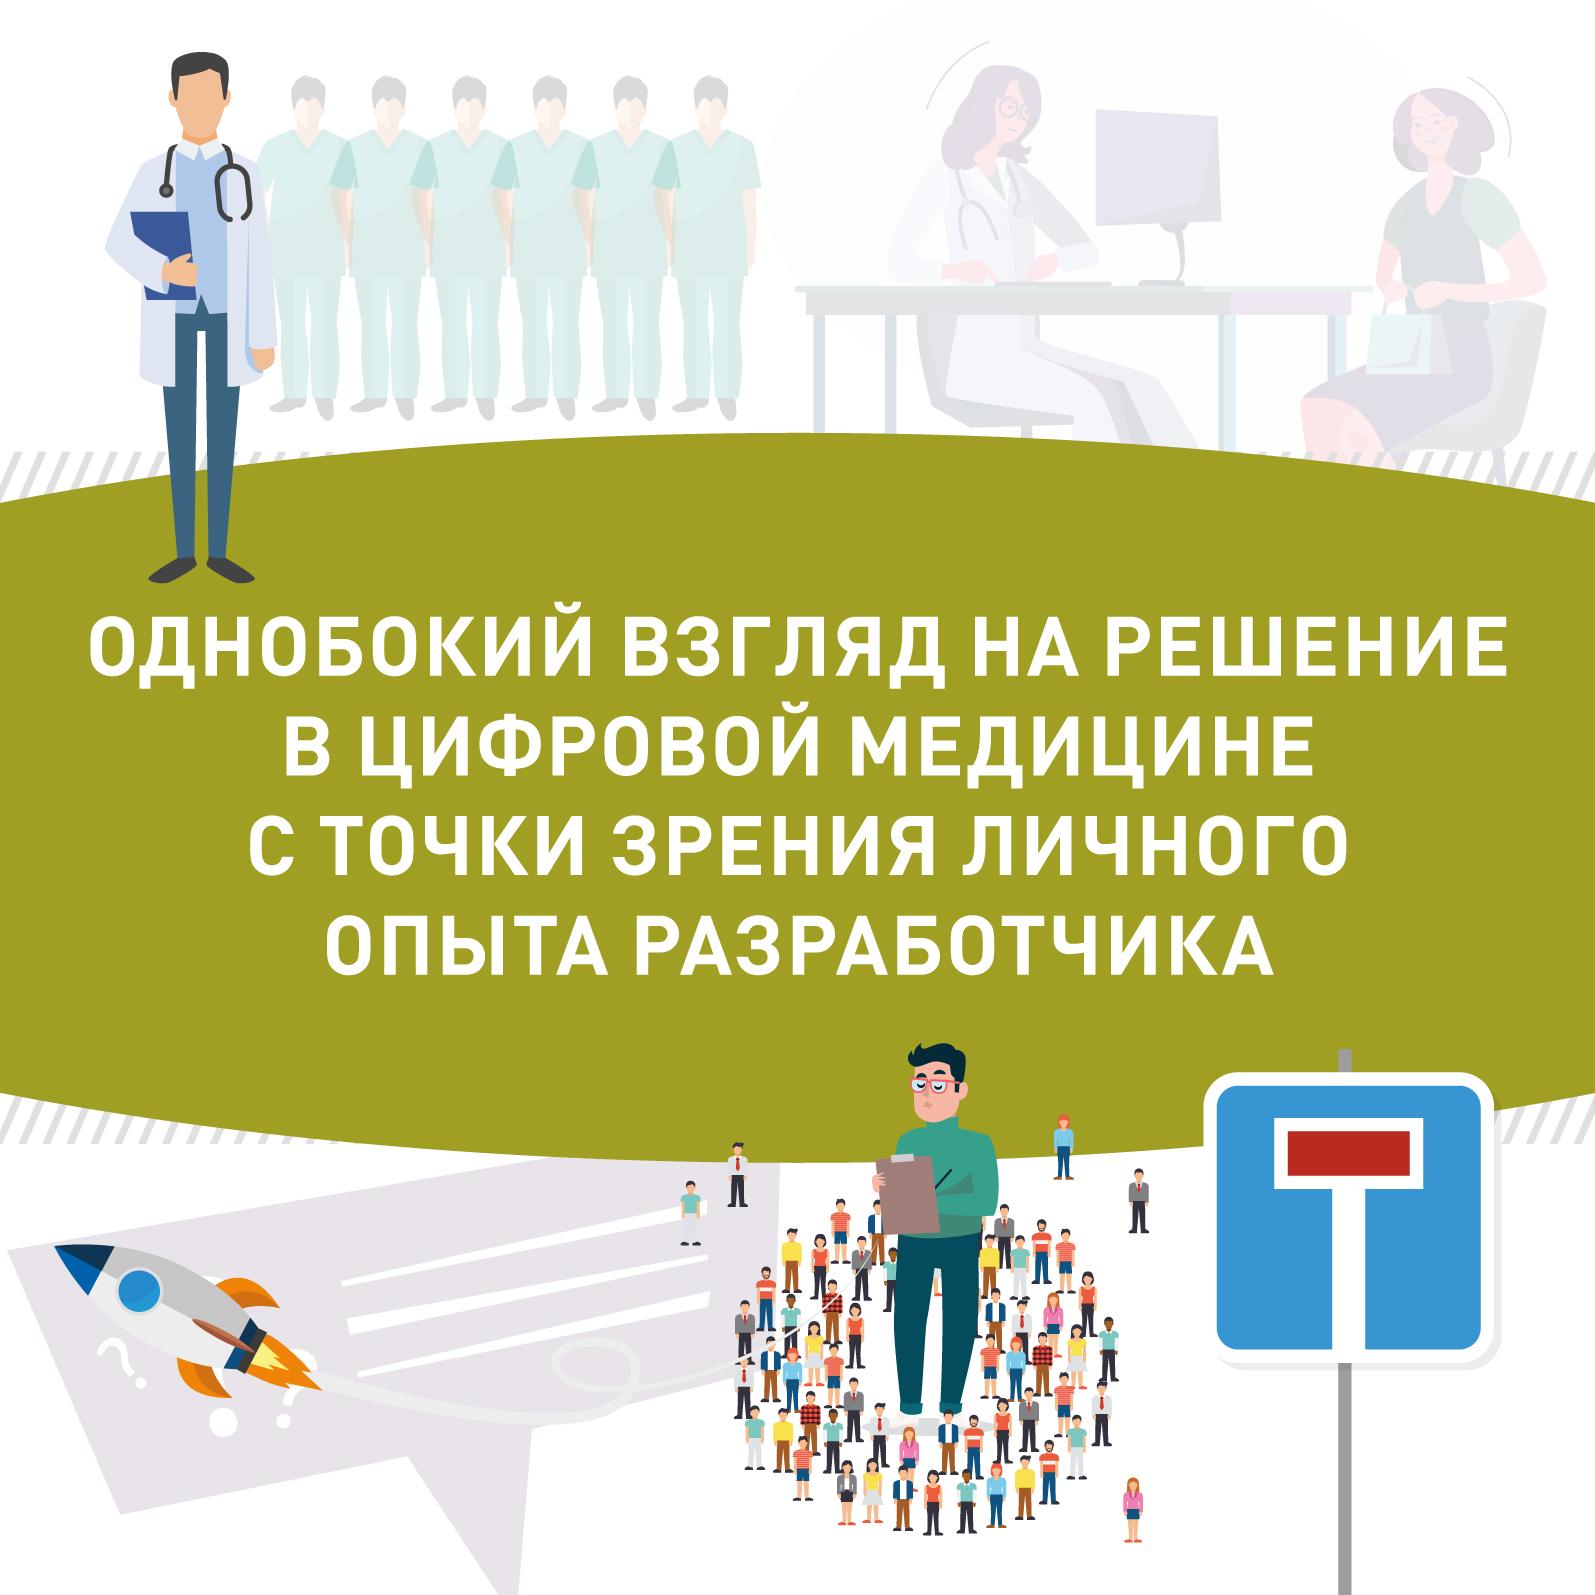 Однобокий взгляд на решение в цифровой медицине с точки зрения личного опыта разработчика